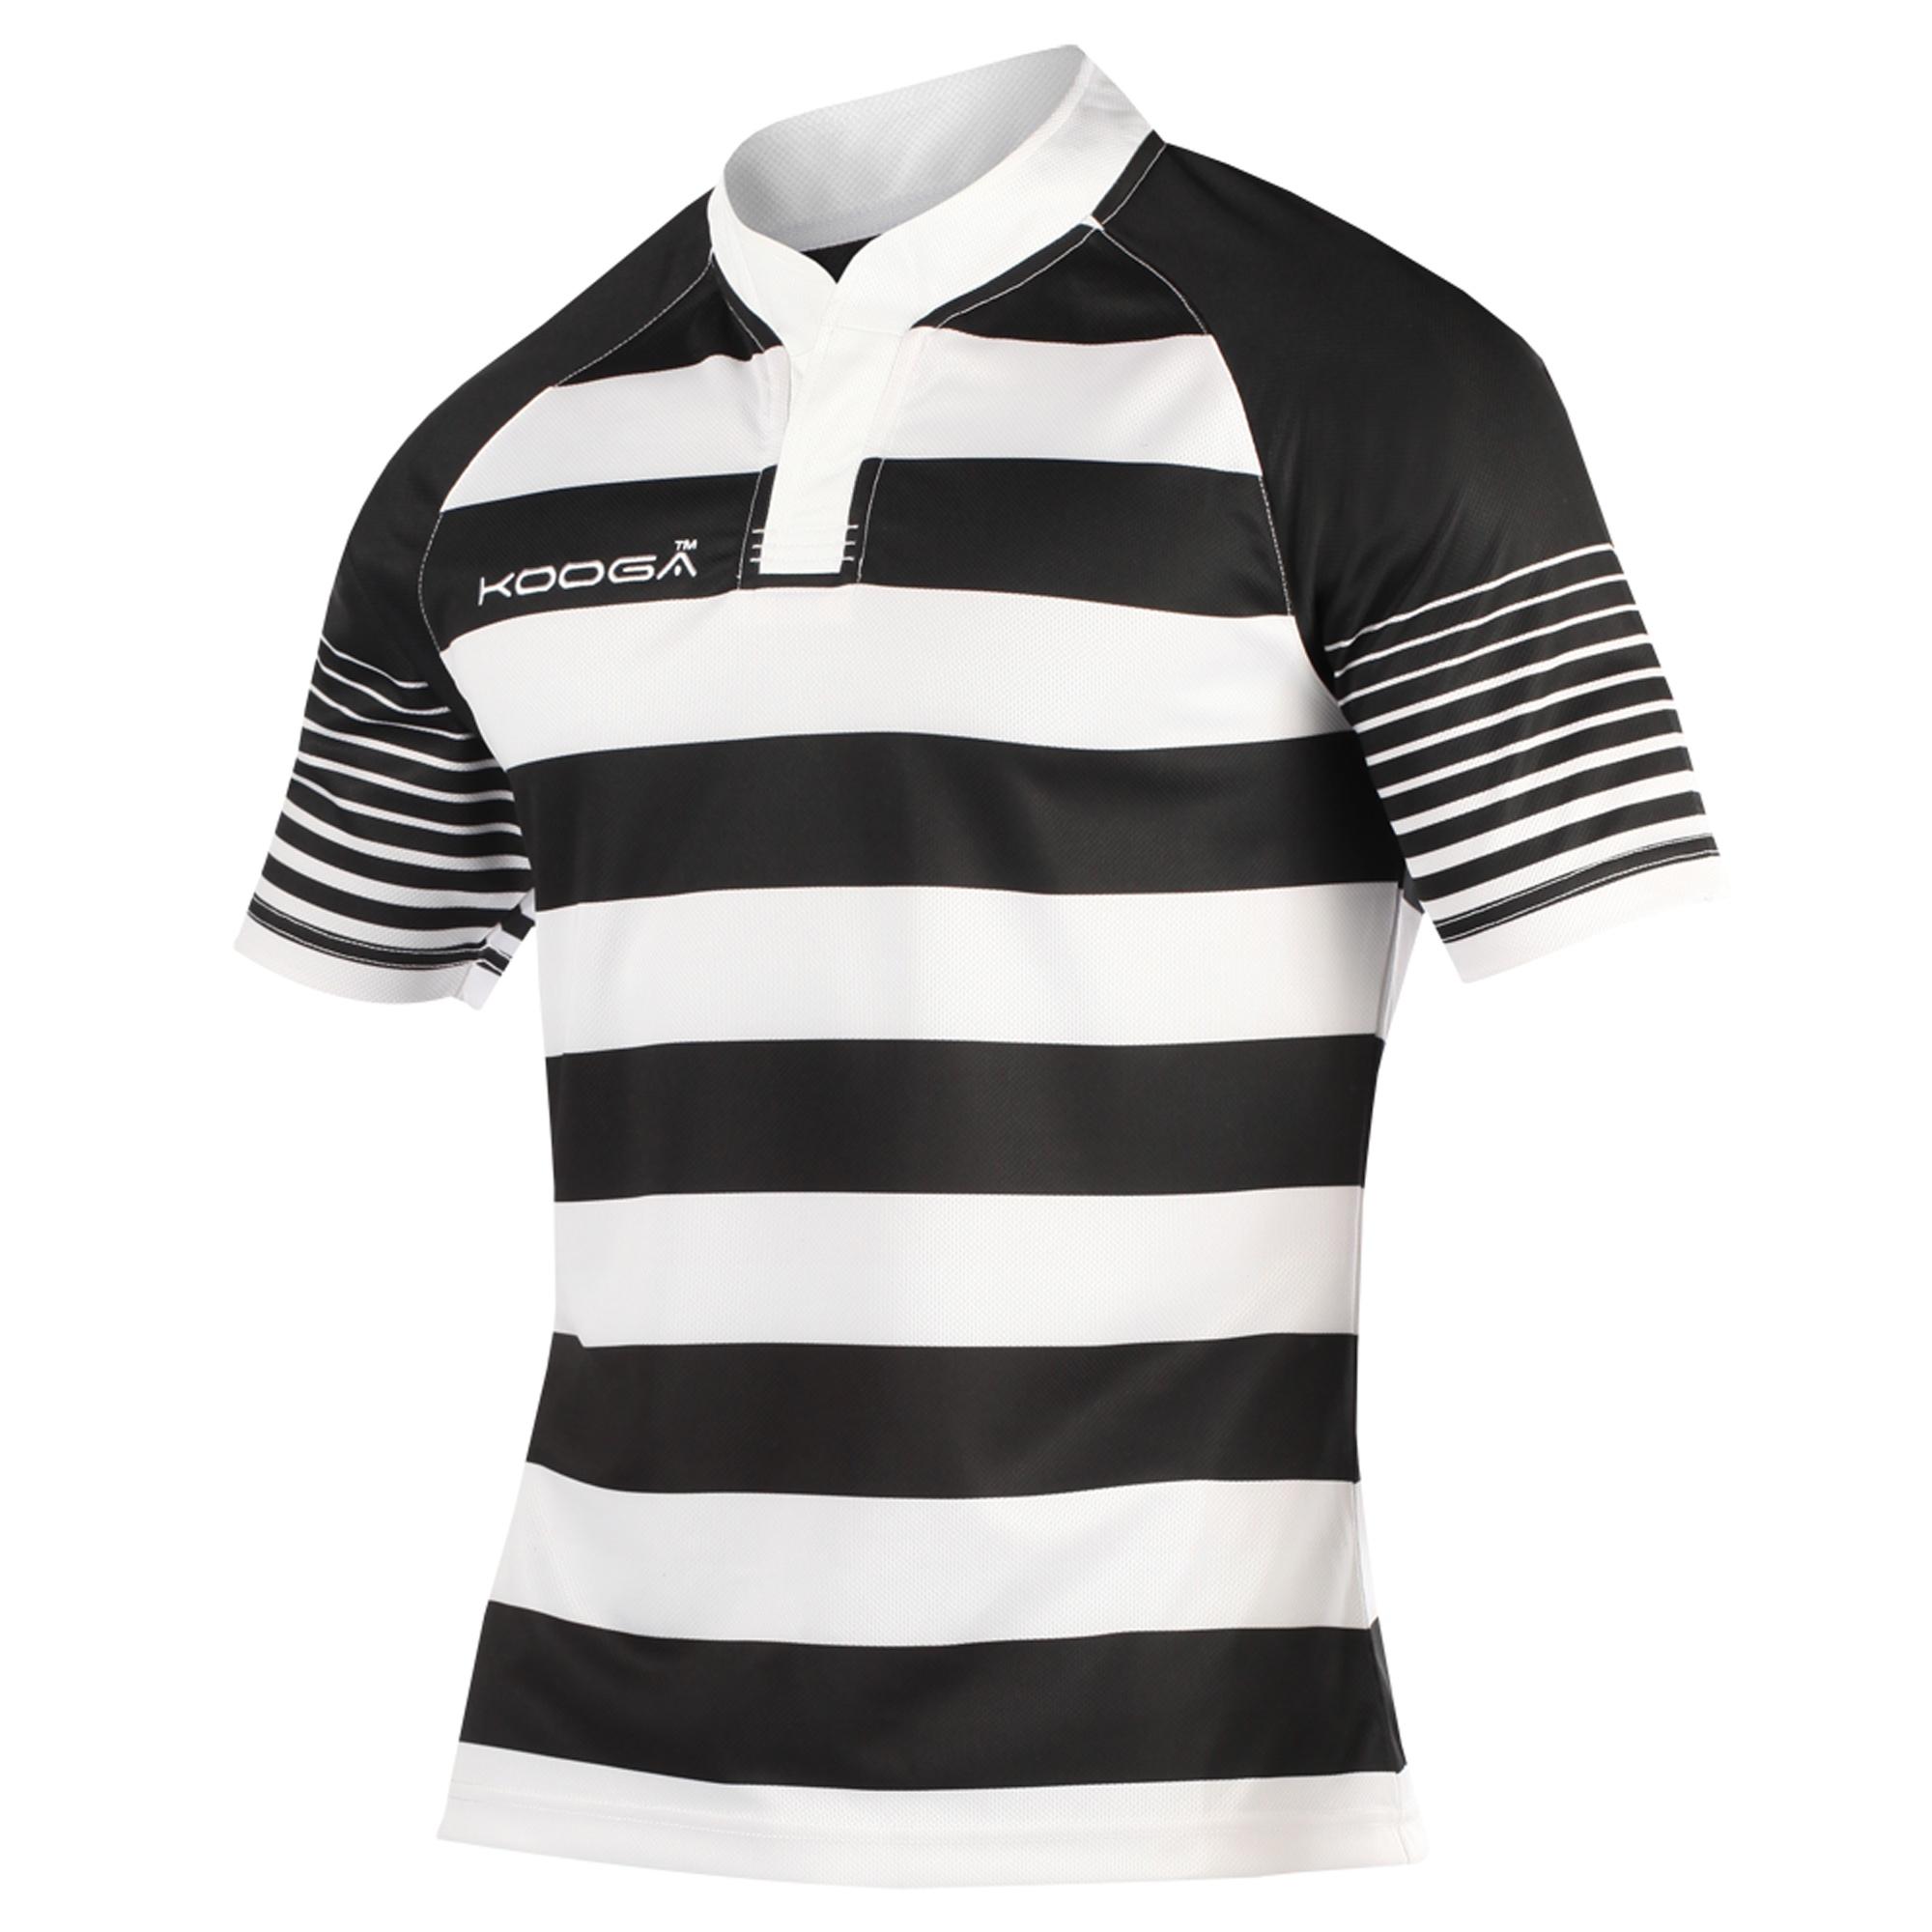 KooGa Boys Junior Touchline Hooped Match Rugby Shirt (XL) (Black/White)